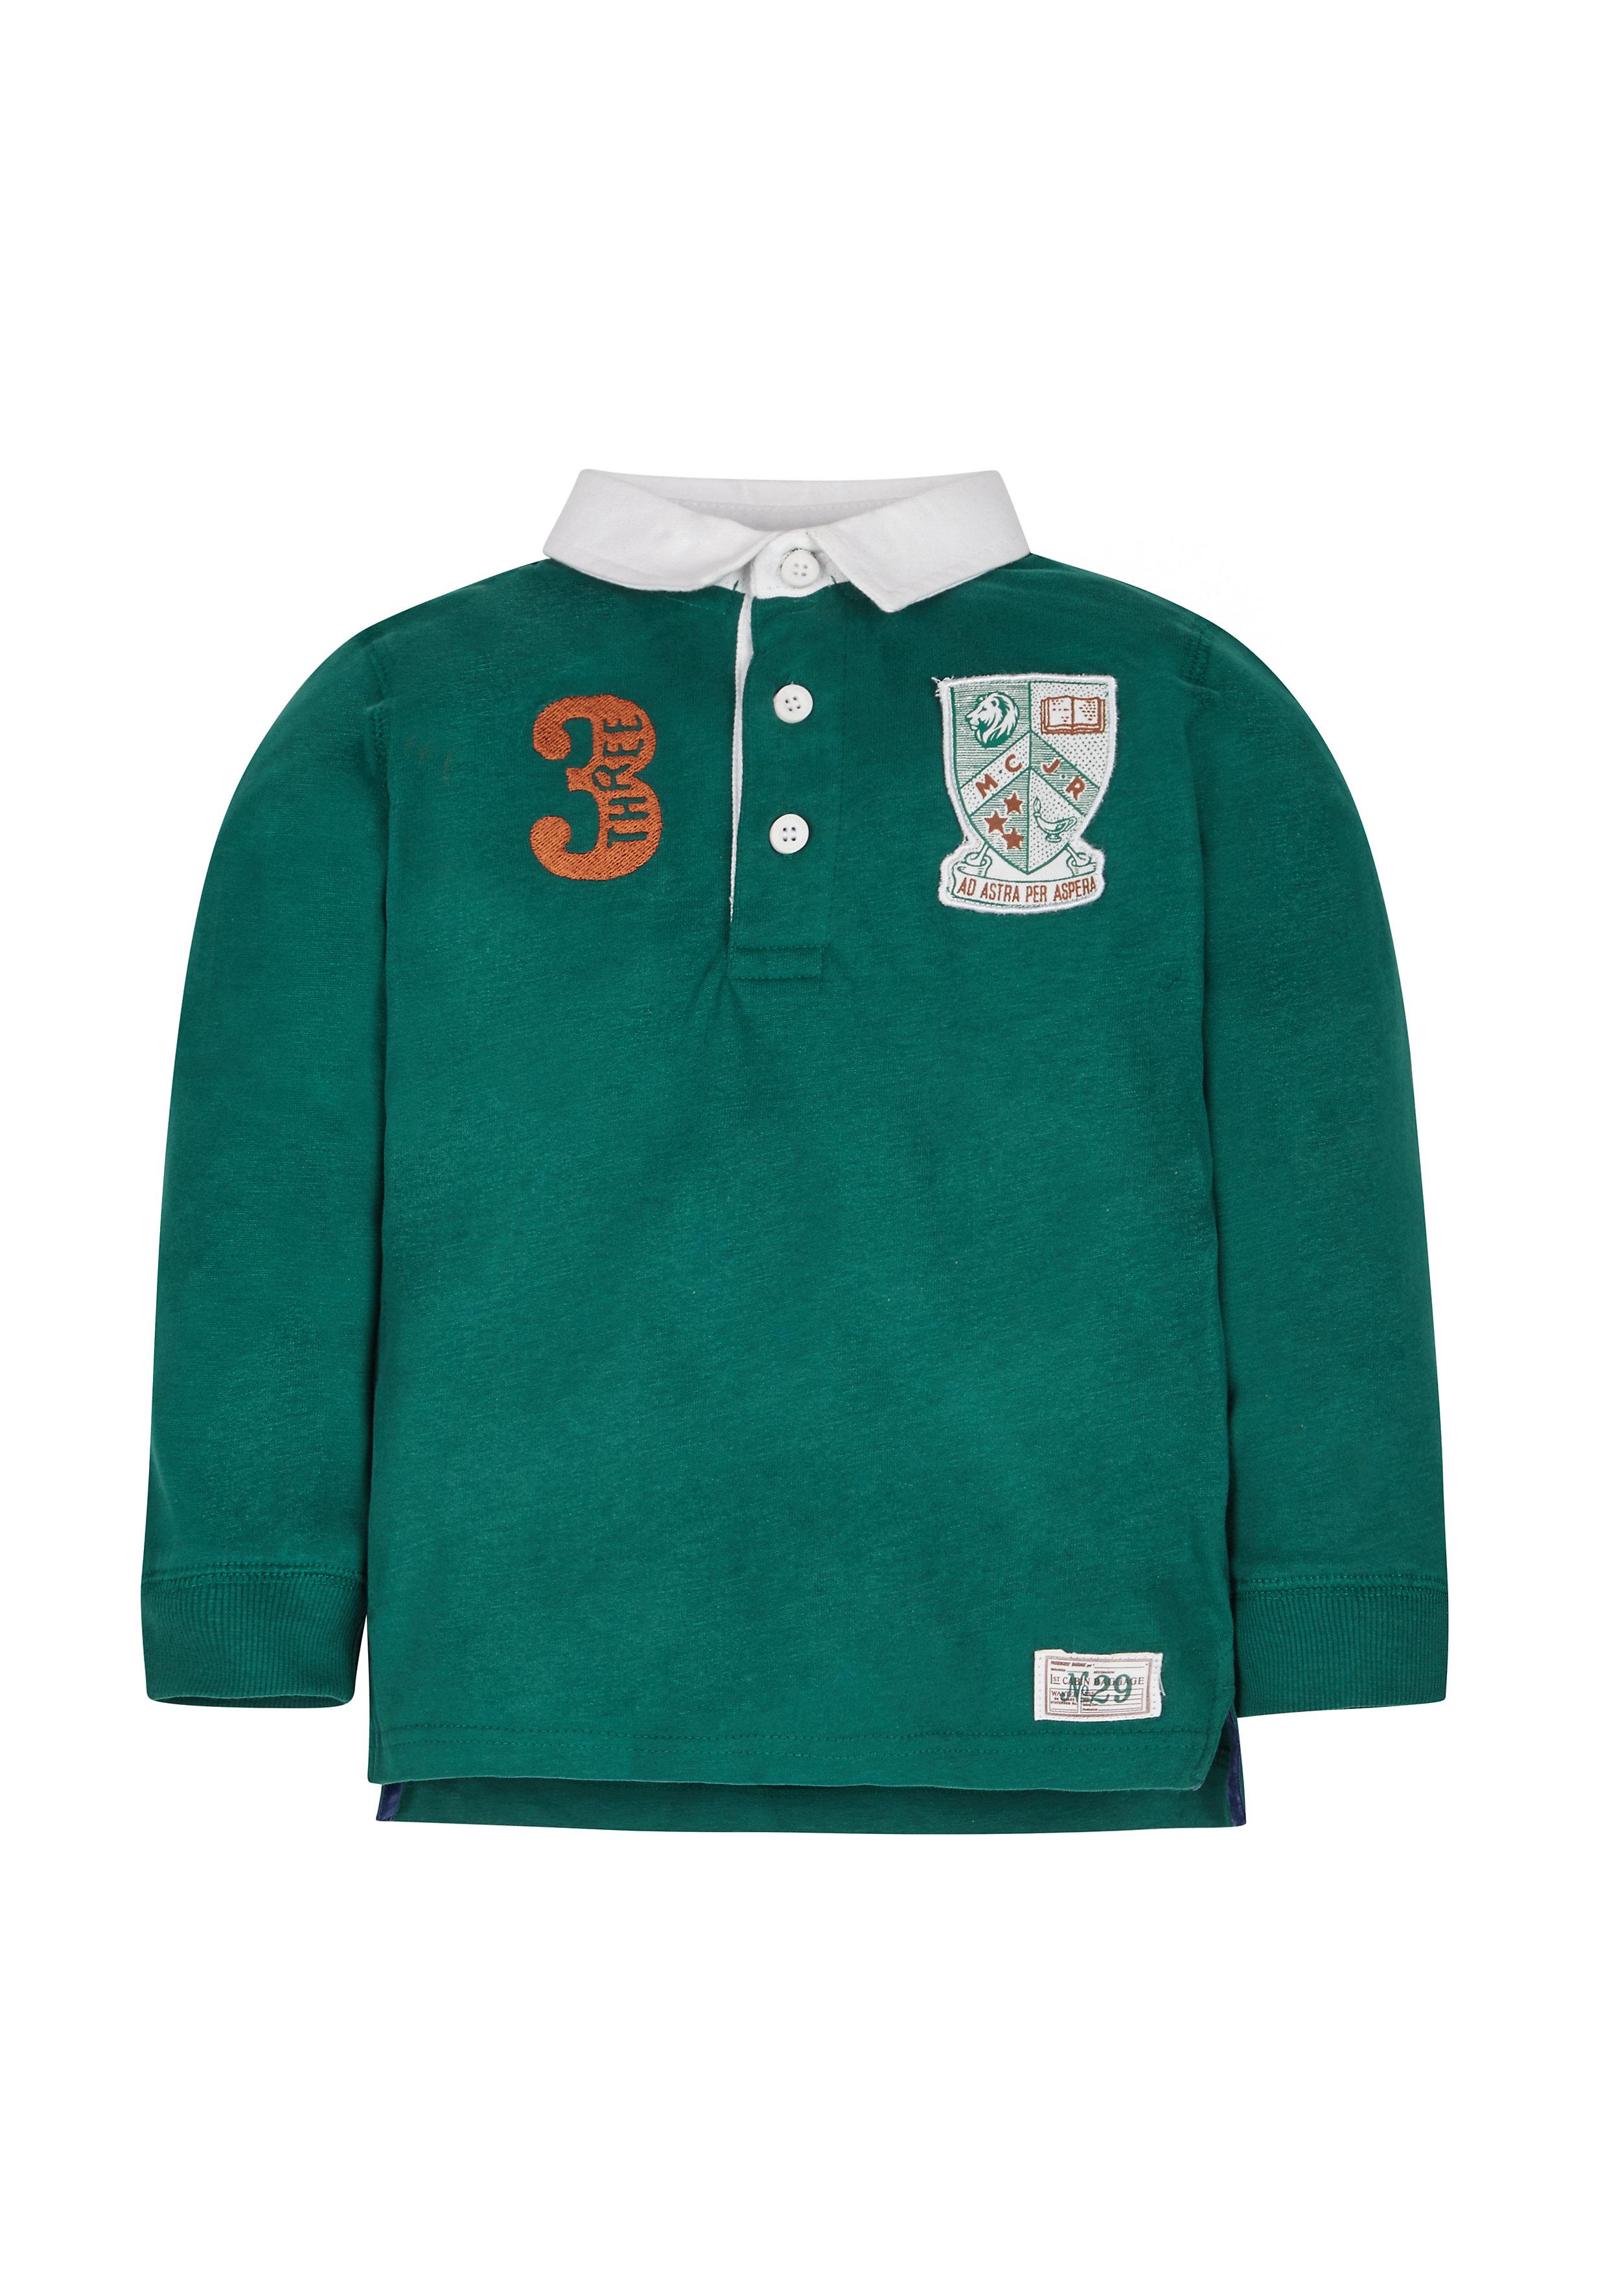 Mothercare | Boys Full Sleeves Polo T-Shirt Badge Detail - Green